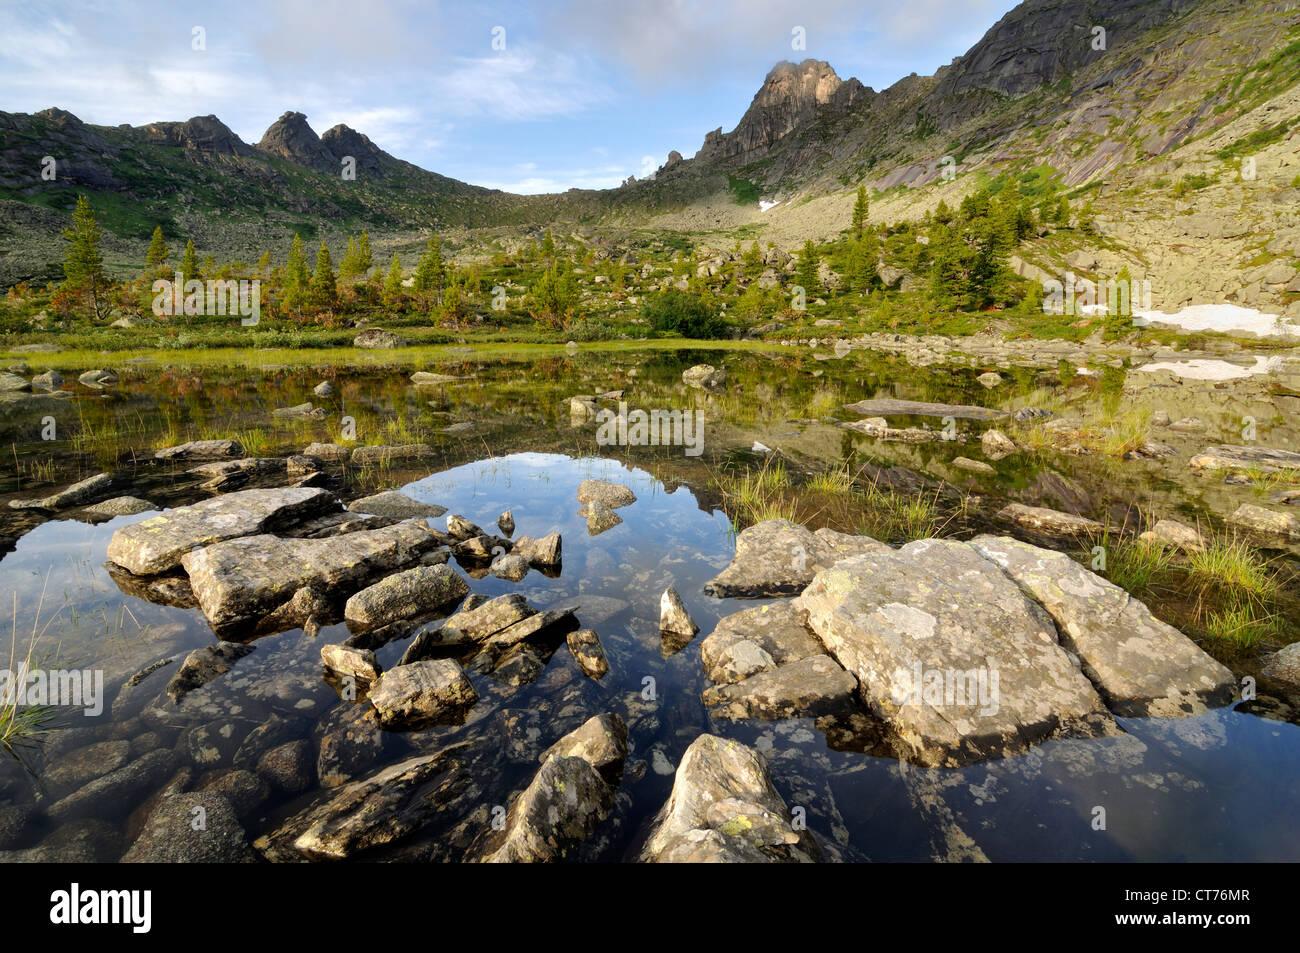 view at hudijnikov pass from nizhneye buibinskoe lake - Stock Image